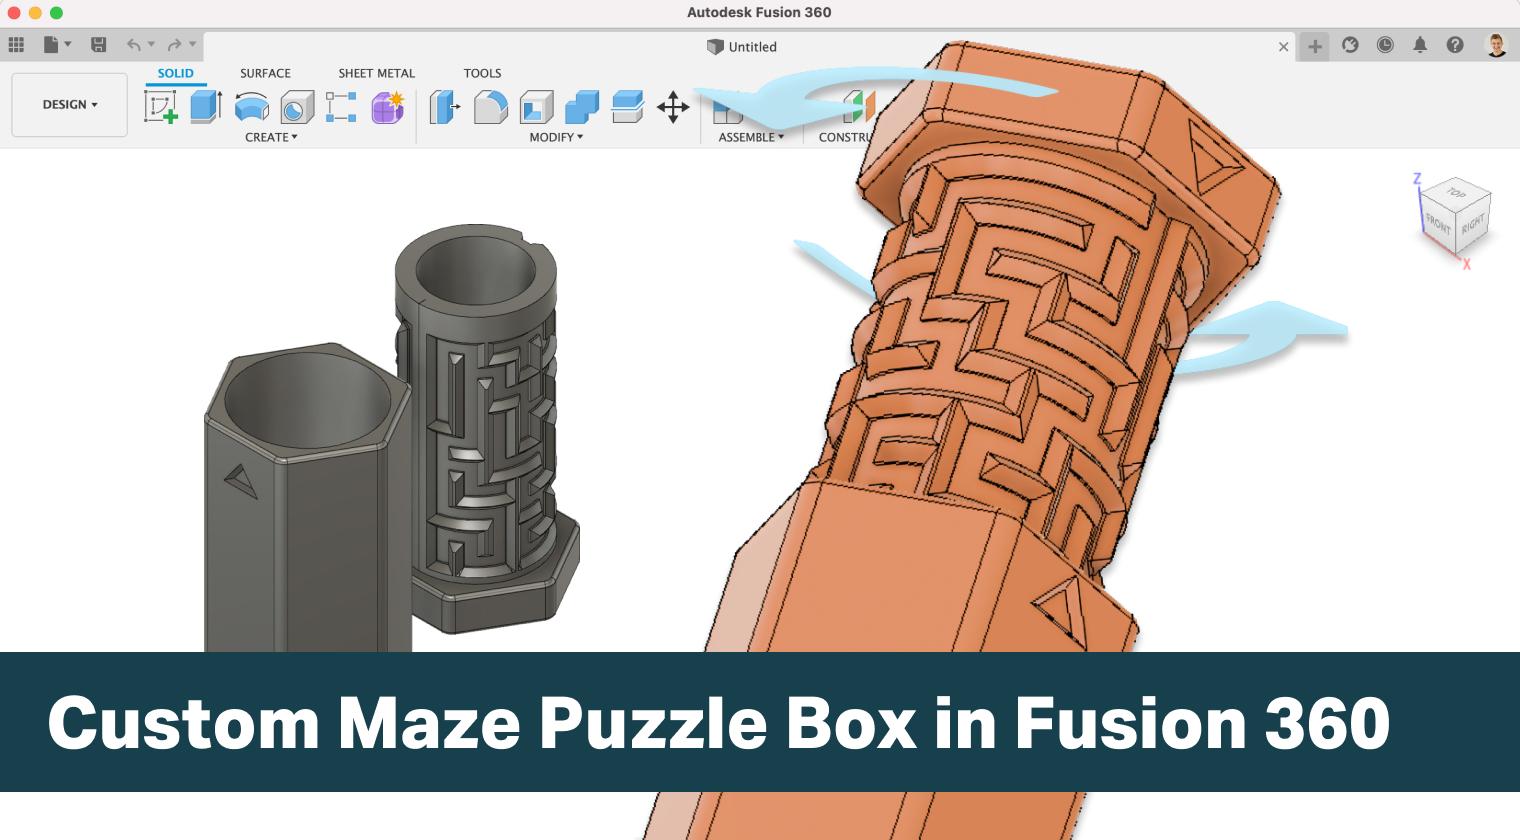 3D Printable Maze Puzzle Box in Fusion 360